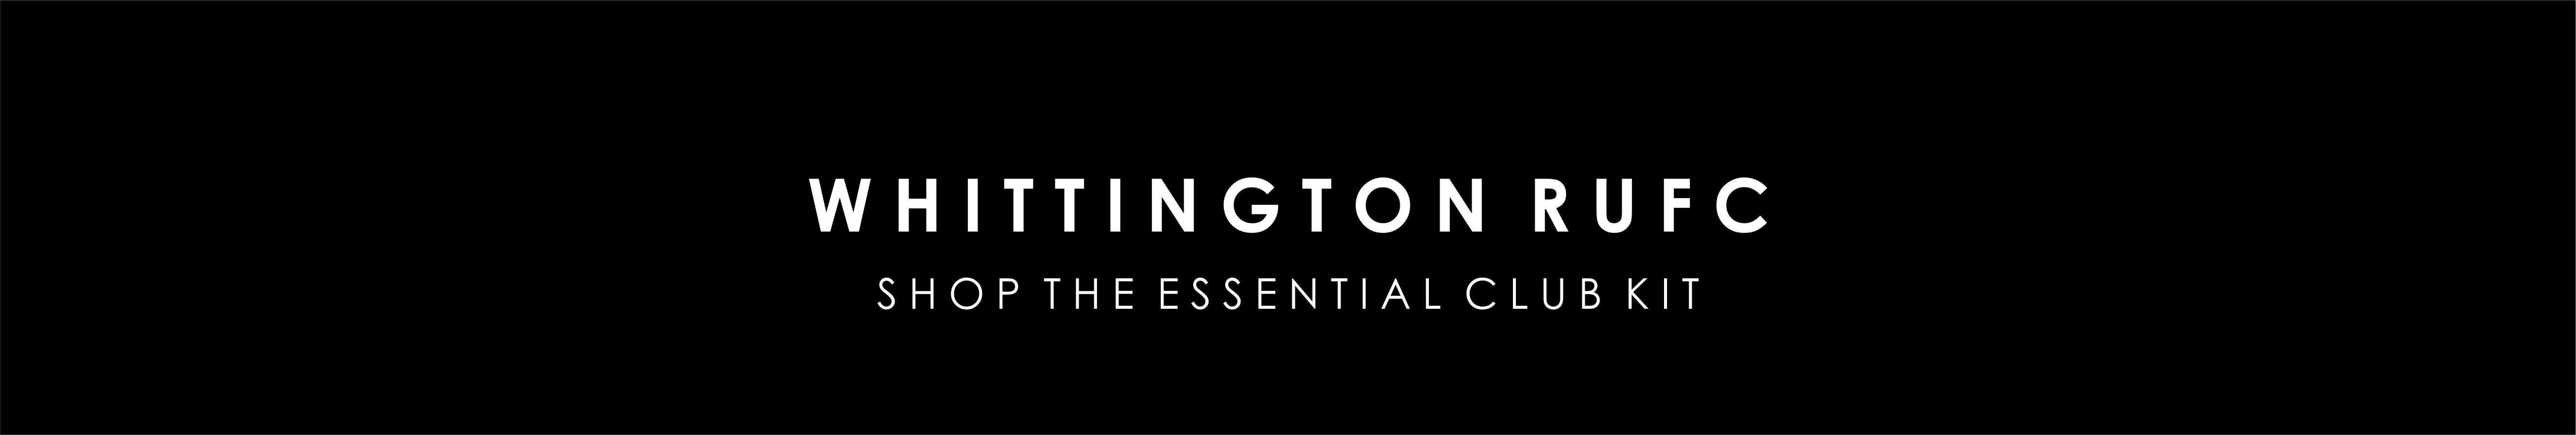 whittington-rugby-banner.jpg